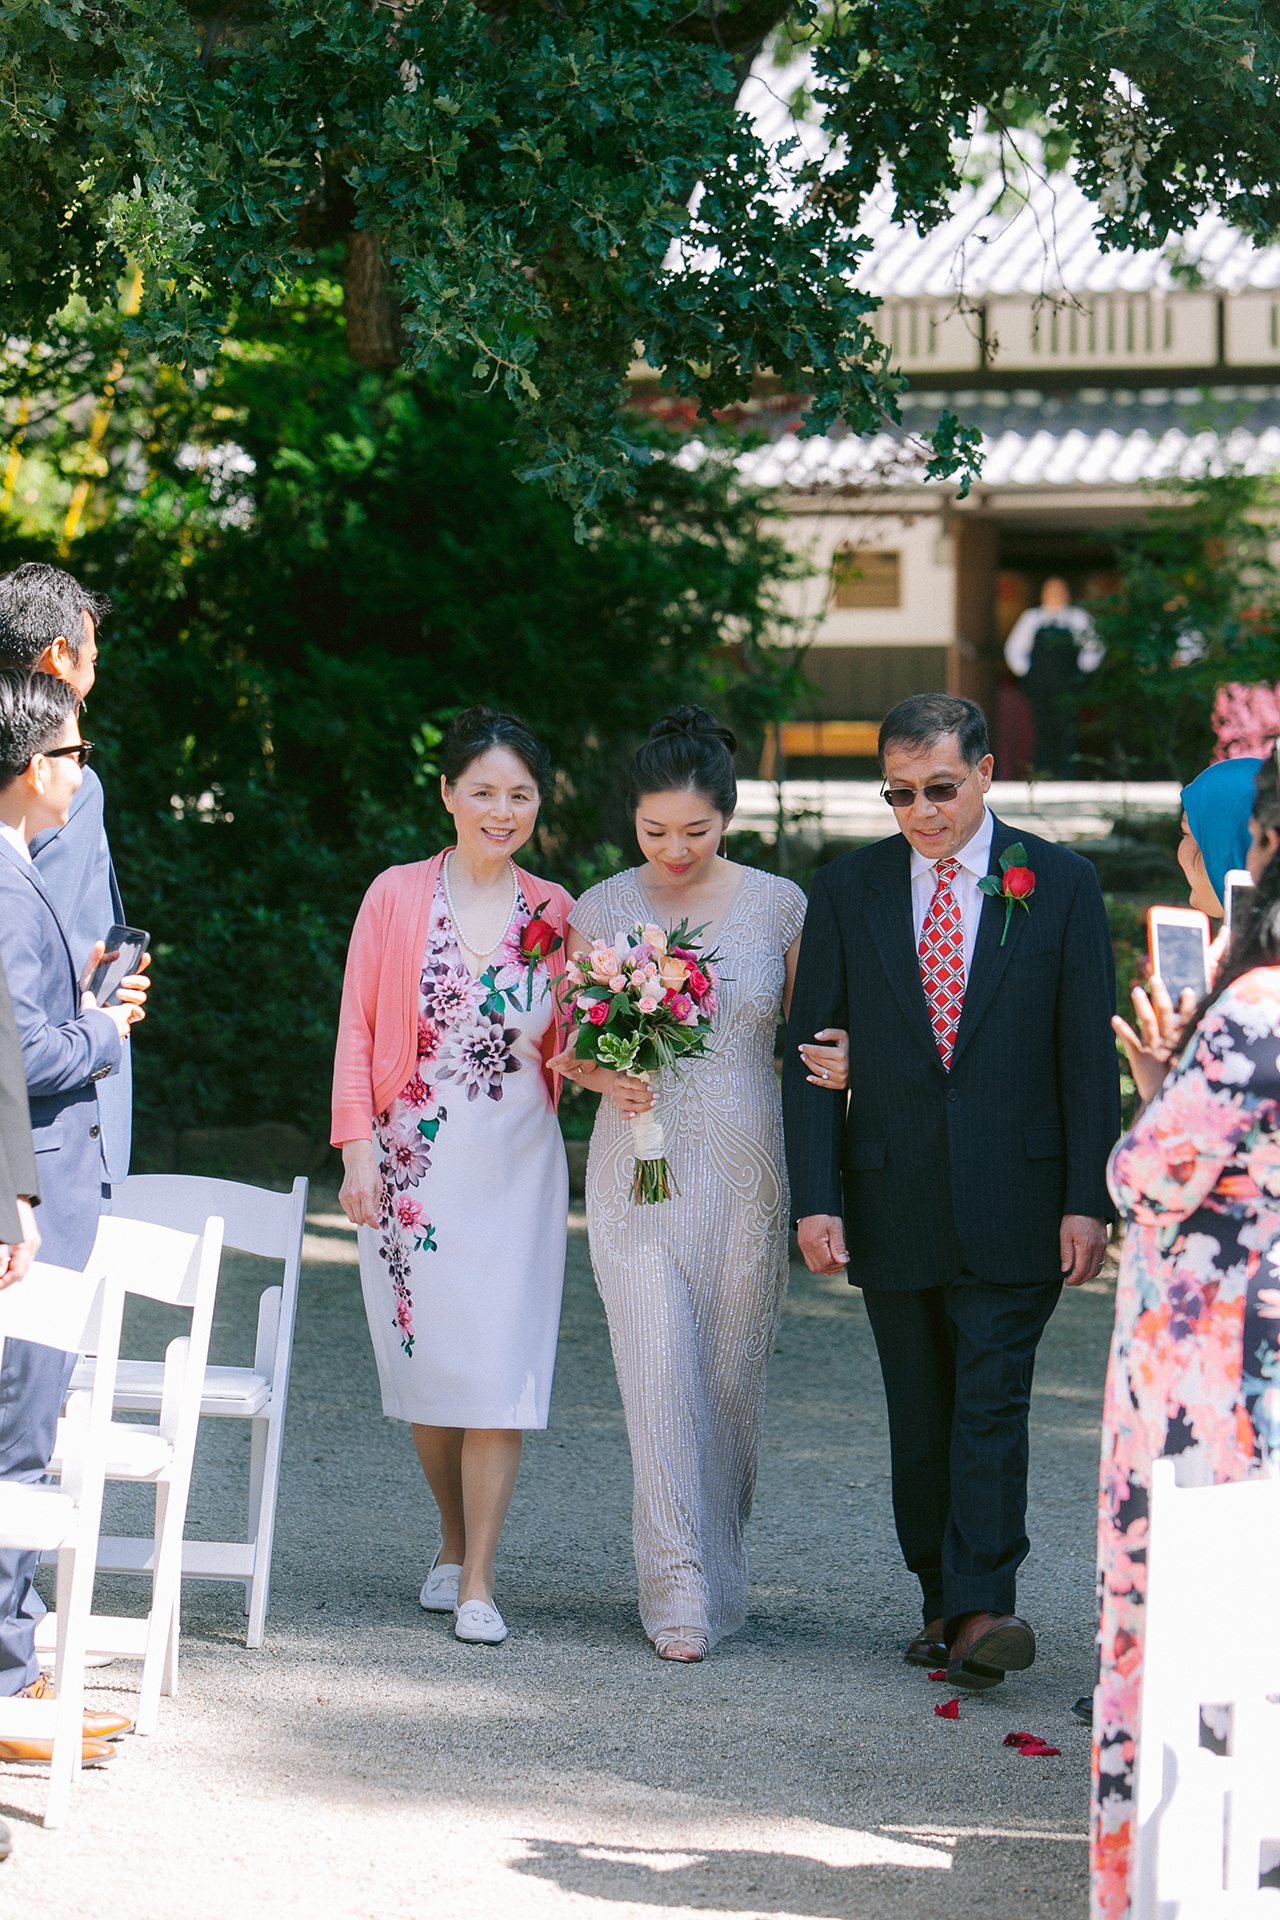 Hakone_Estate_and_Gardens_Wedding_022.jpg